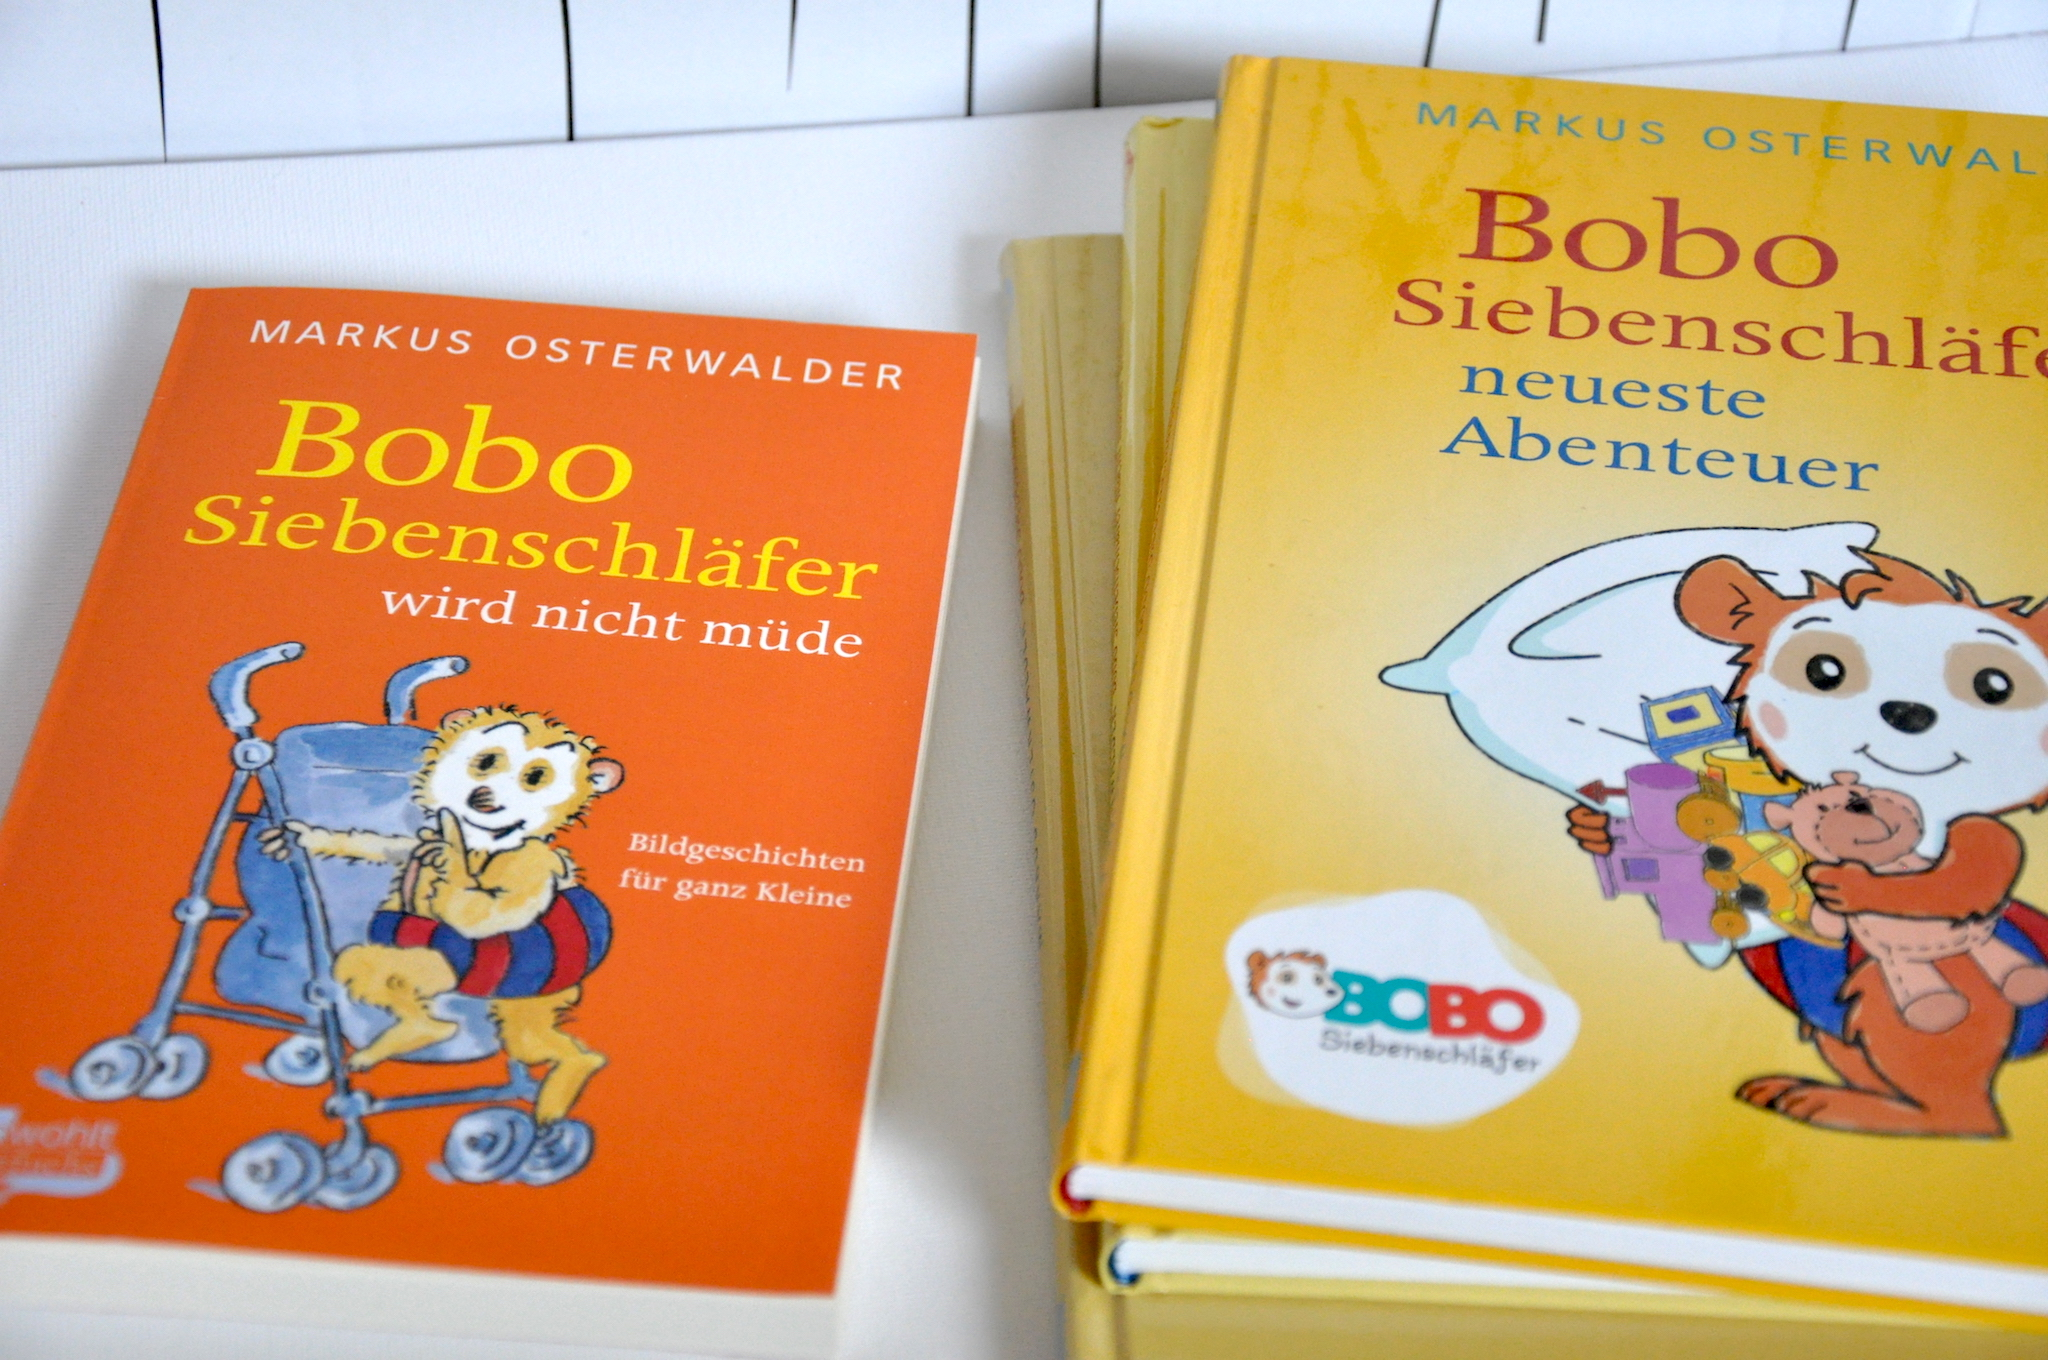 160323-Bobo-Siebenschläfer-04